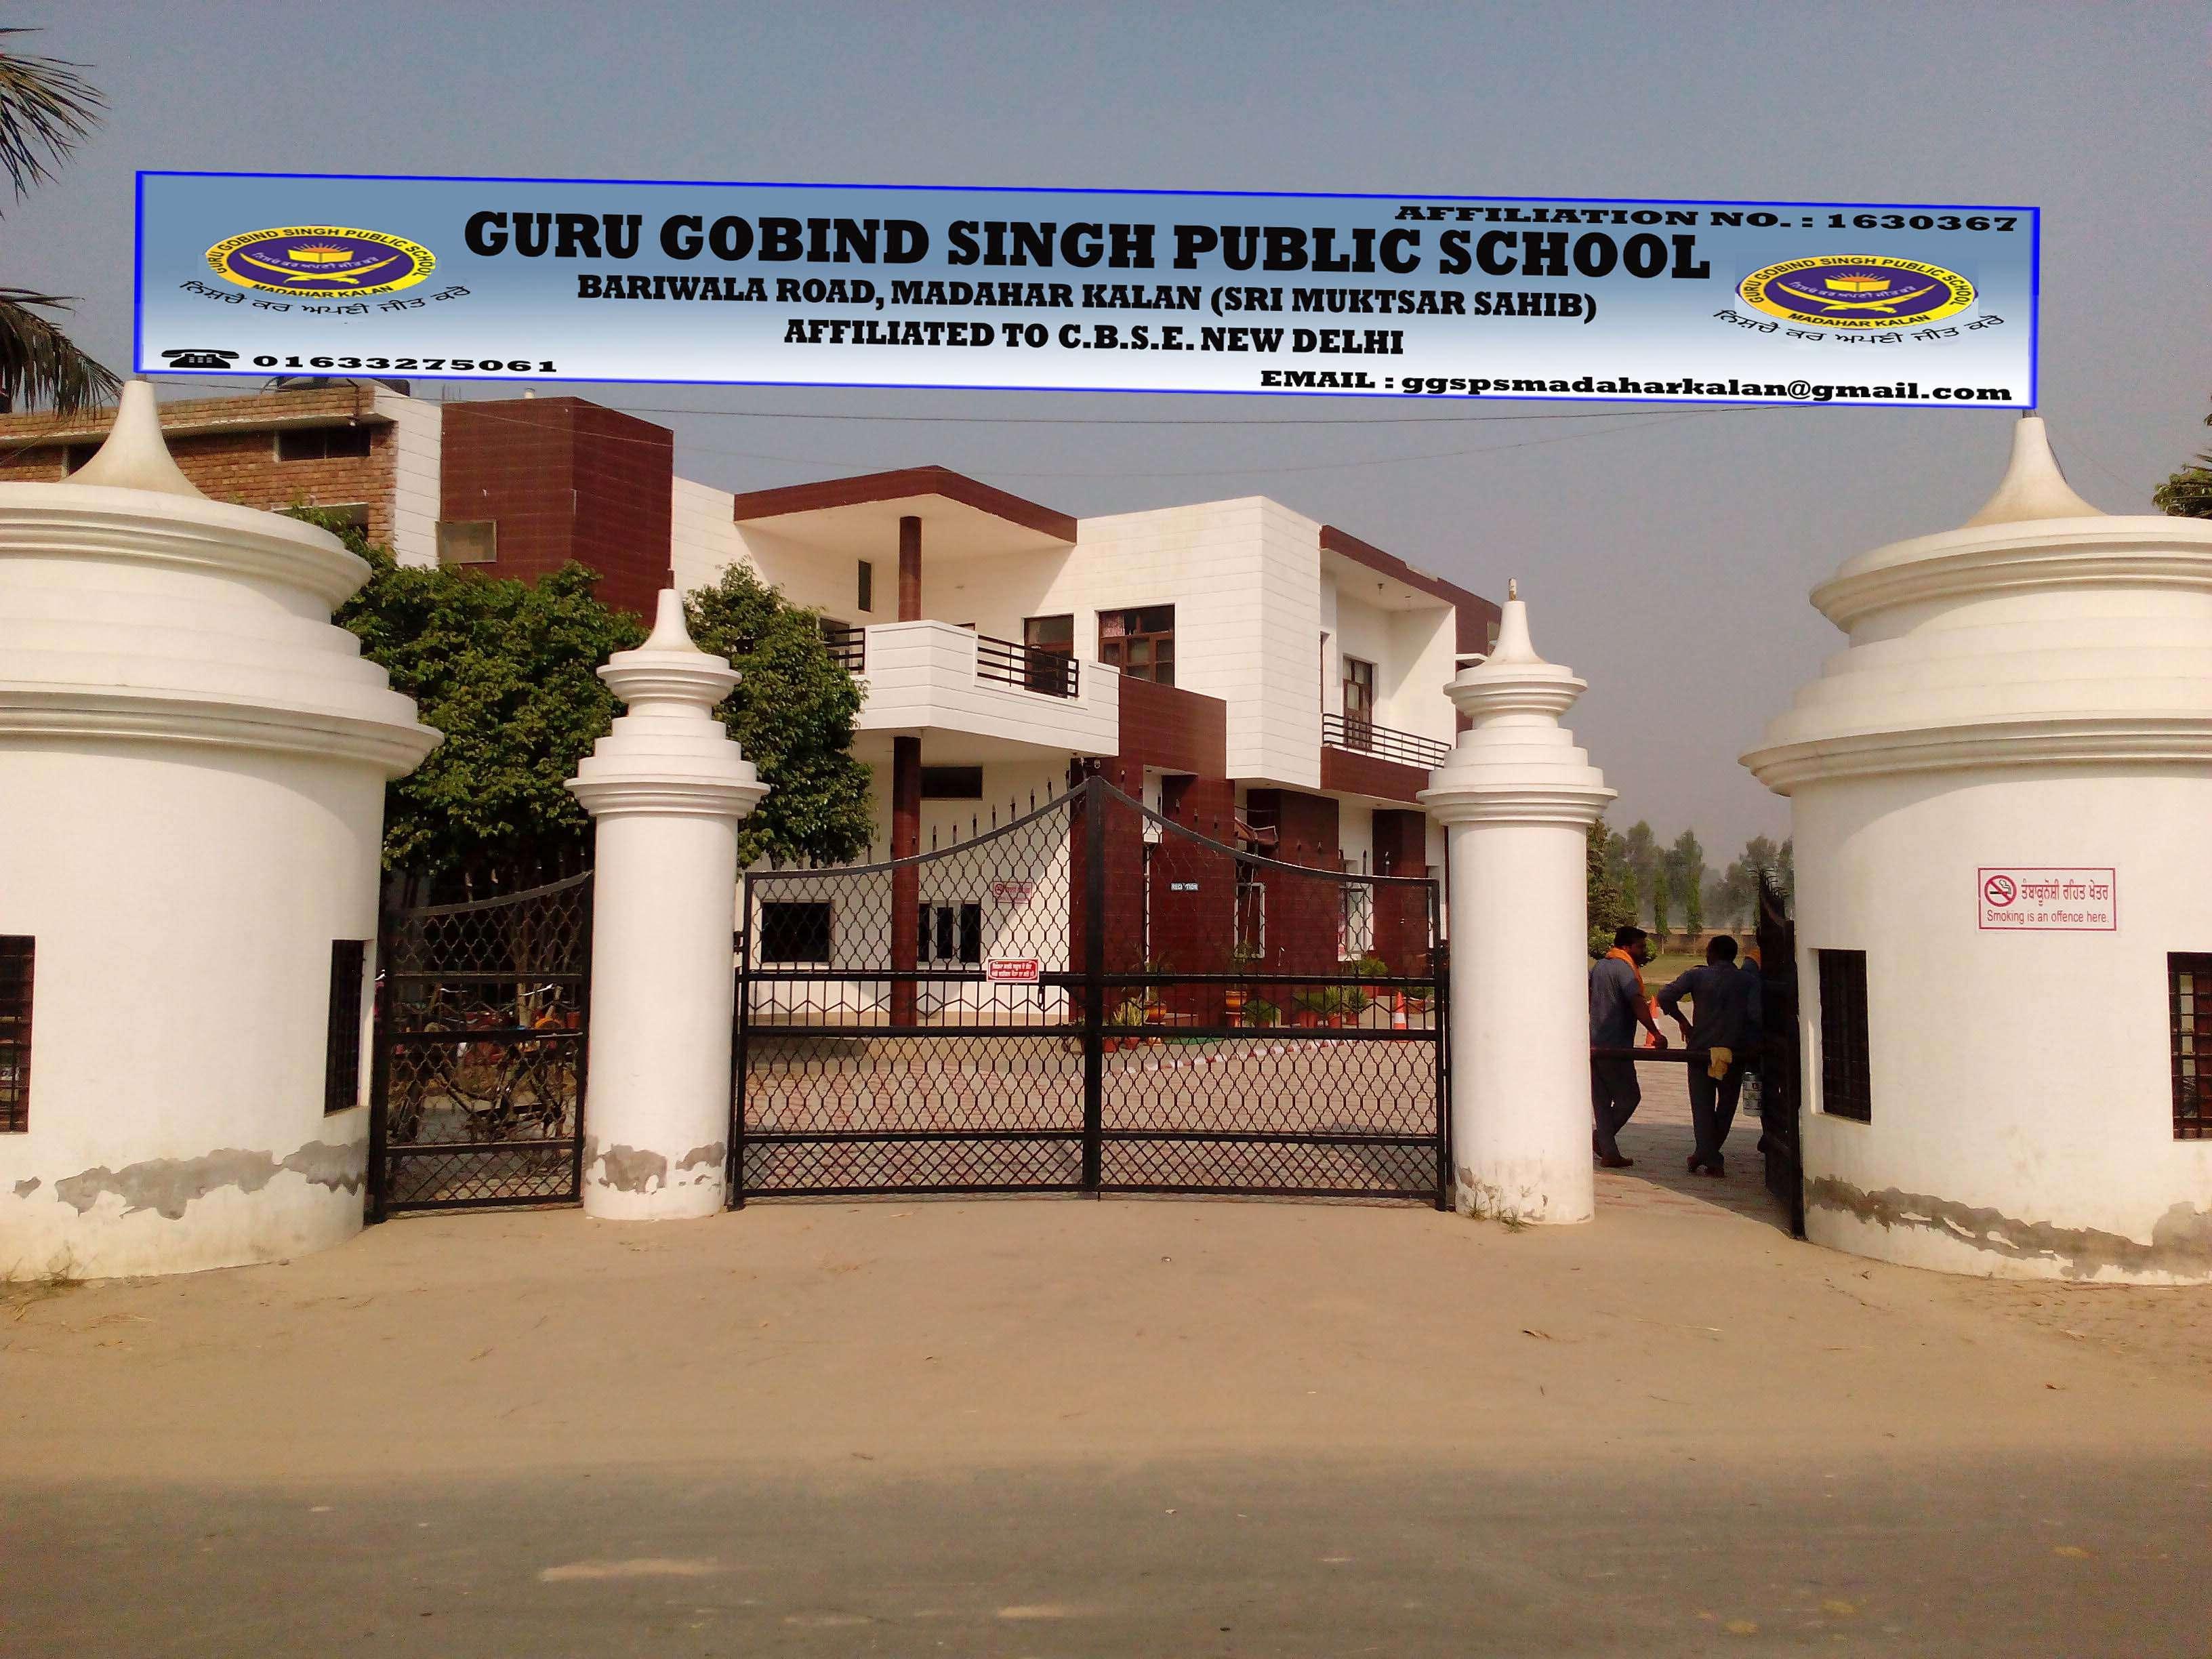 GURU GOBIND SINGH PUBLIC SCHOOL VILL MADAHAR KALAN BARIWALA ROAD DISTT MUKTSAR PUNJAB 1630367